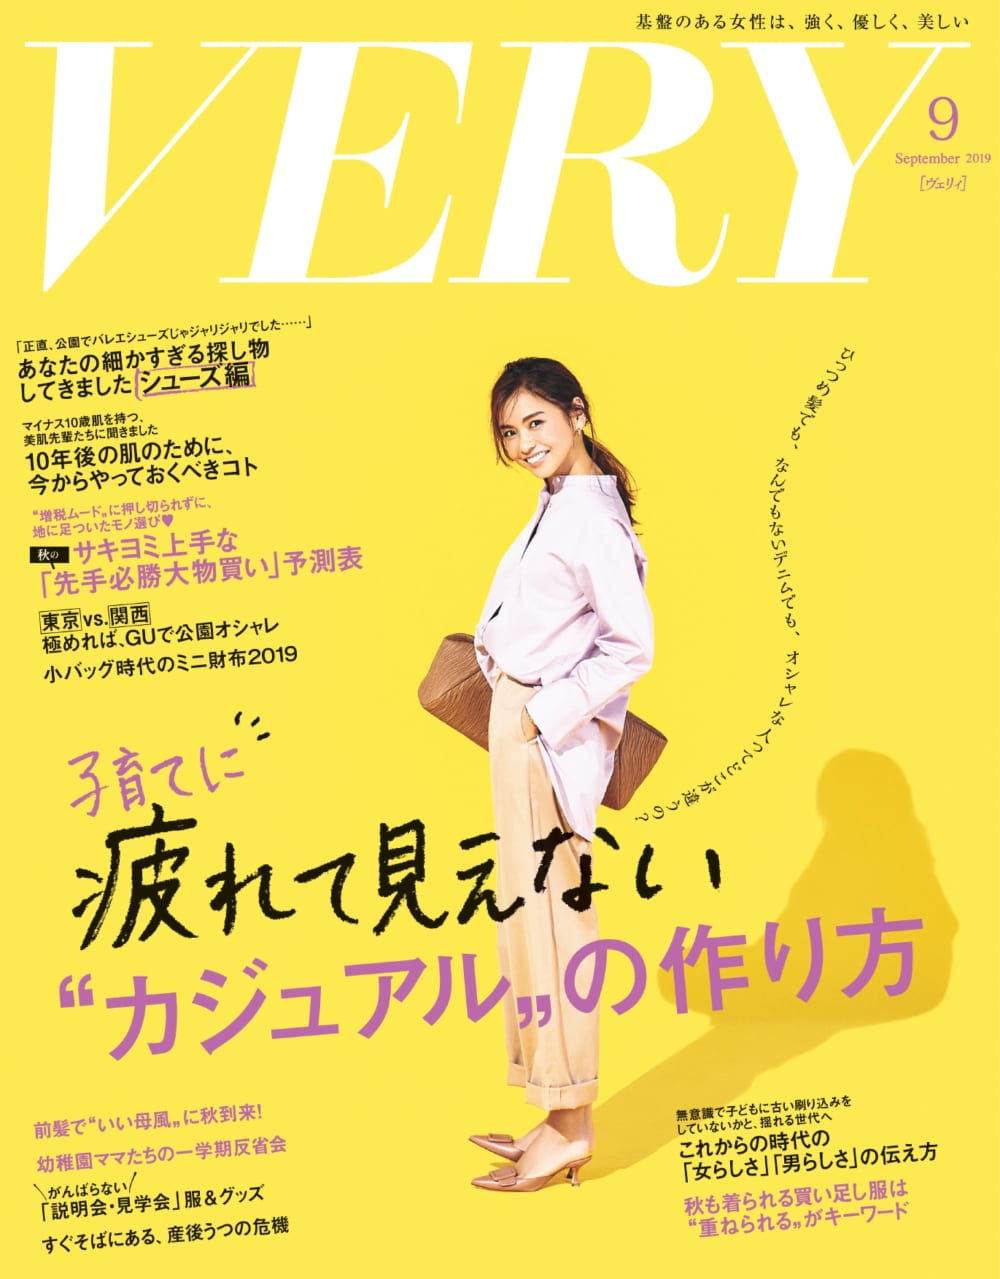 2019/08/VERY_1909_001_page-0001.jpg